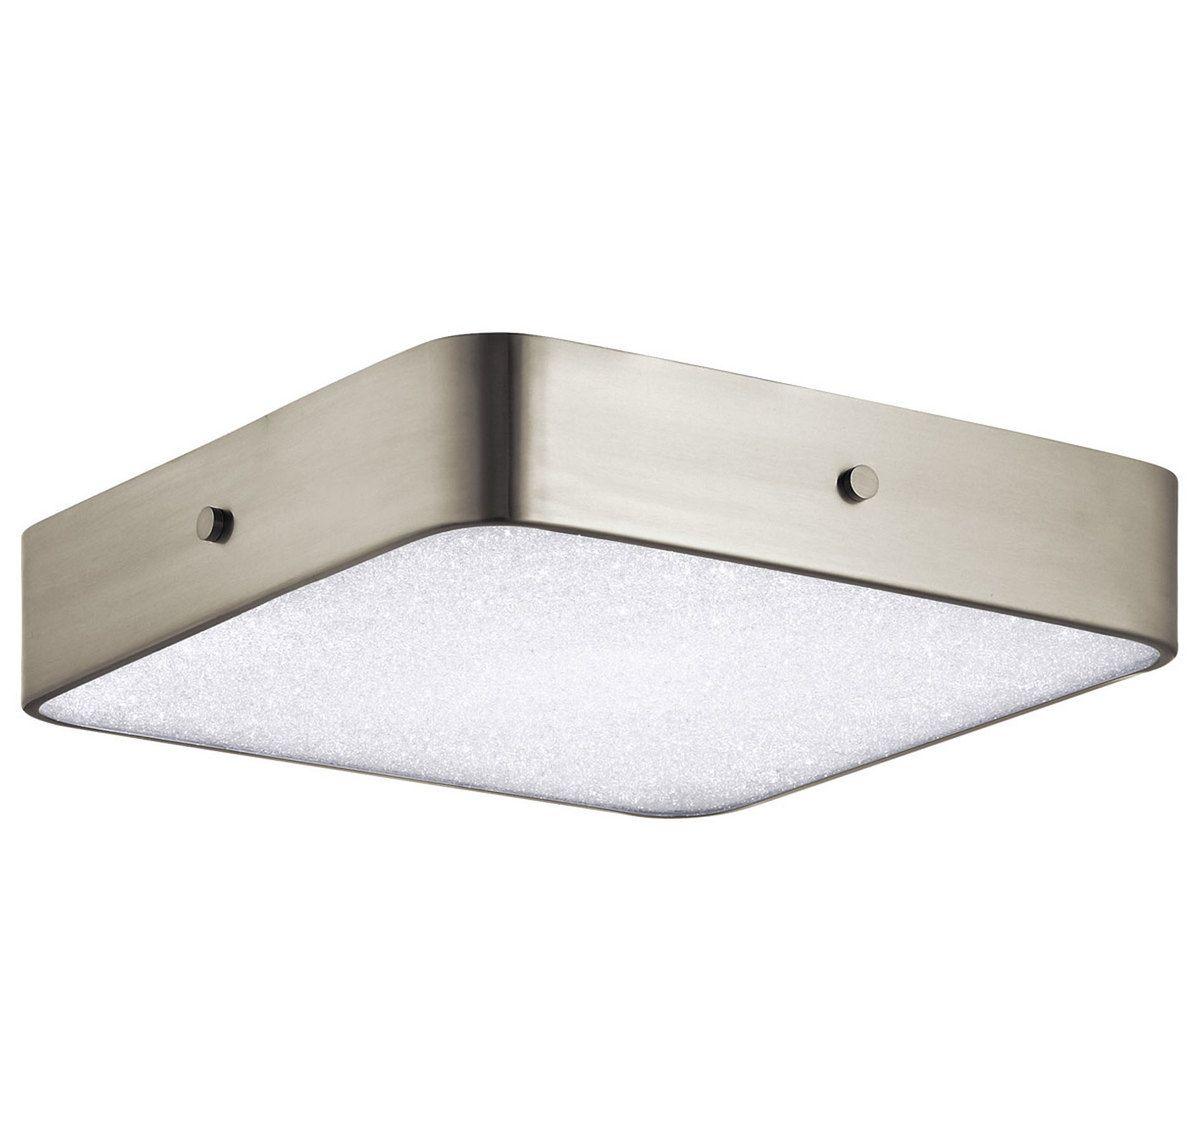 Elan crystal moon 15 75 led square ceiling light in brushed nickel